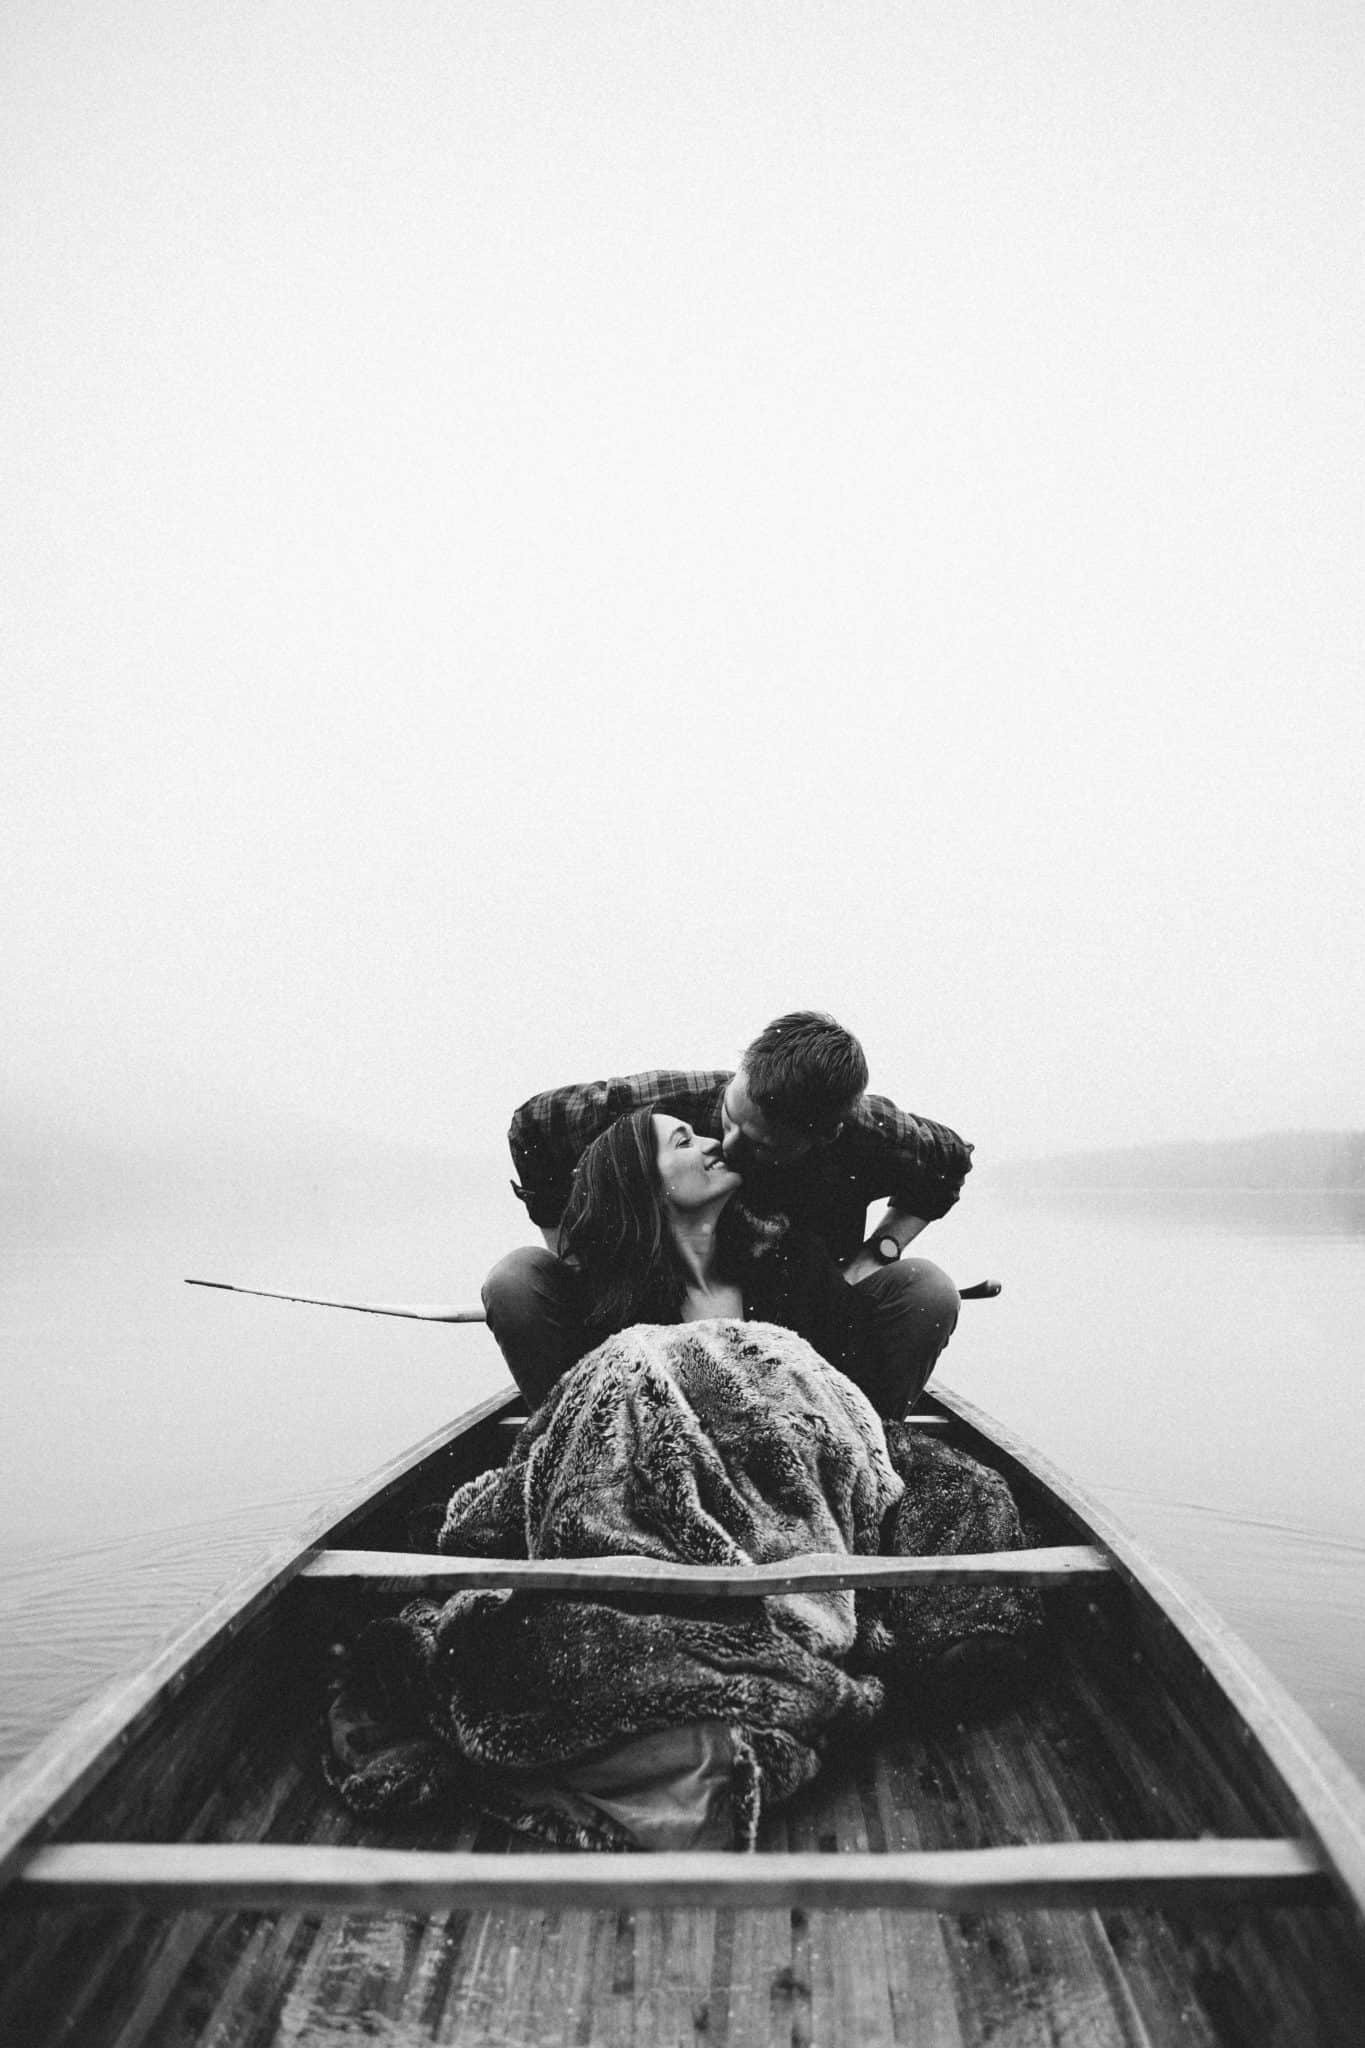 Lake Wenatchee - PNW Engagement shoot locations - TheMandagies.com